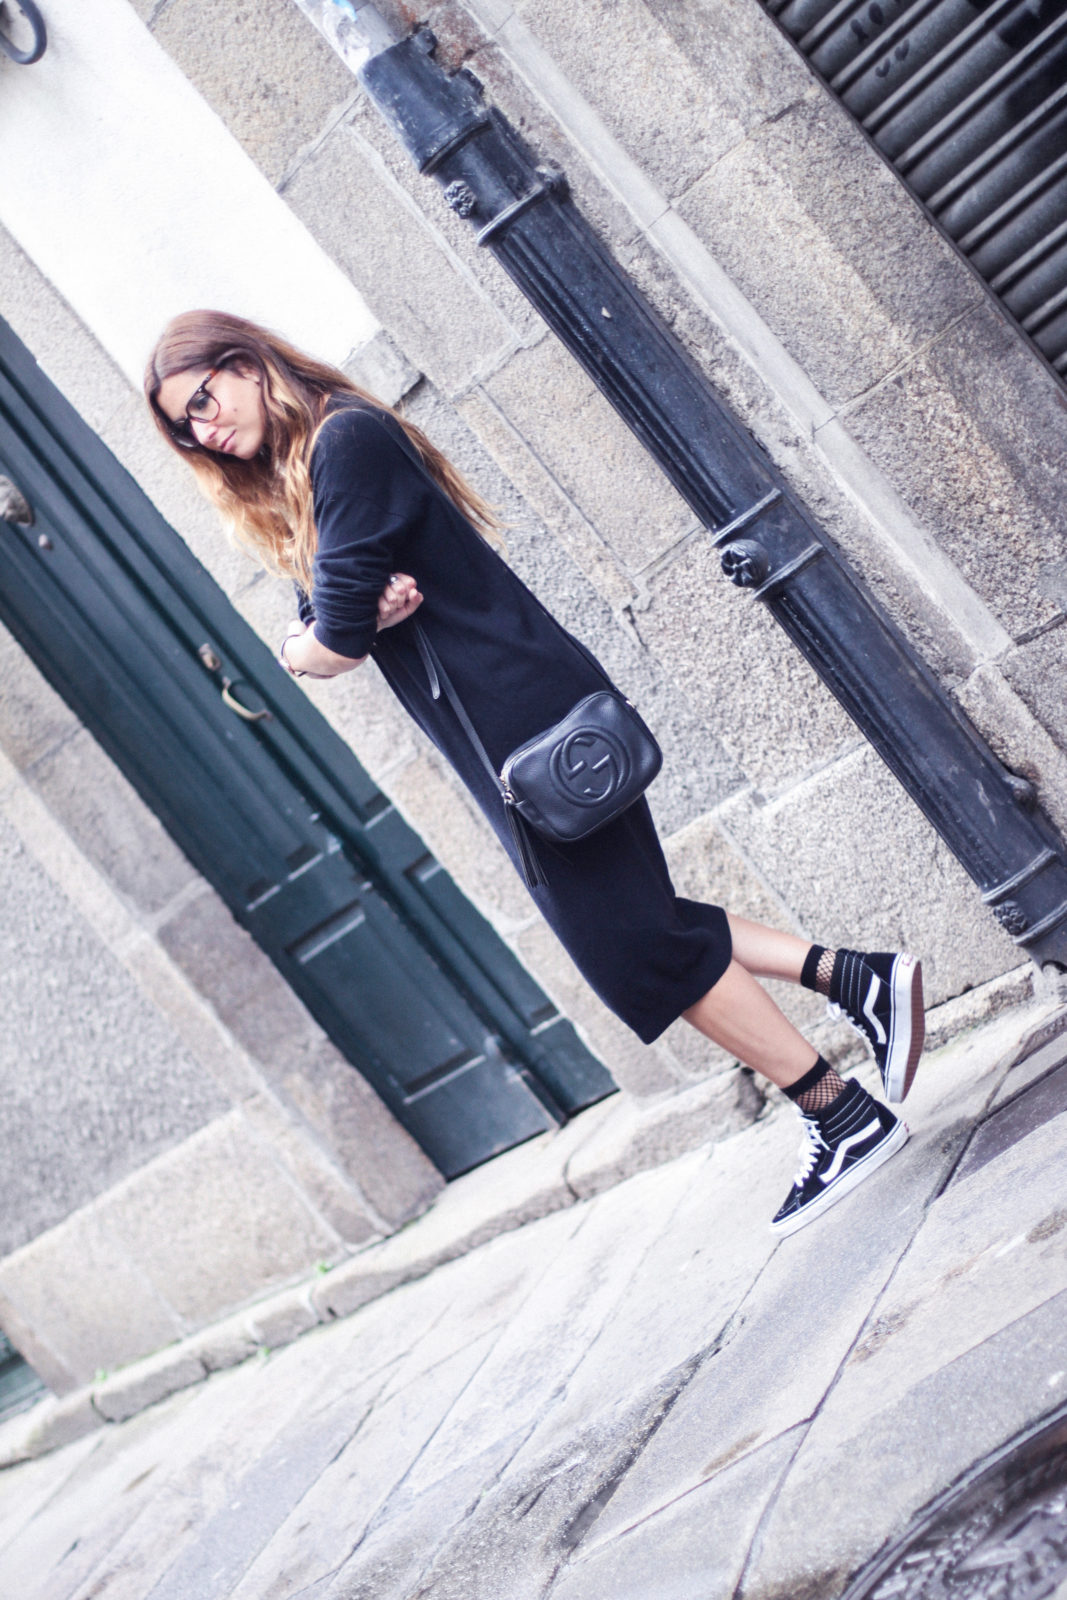 vestido_de_punto_midi_vans_calcetines_rejilla_choker_metalico_happiness_boutique_abrigo_largo_gucci_street_style_fall_2016_donkeycool-41